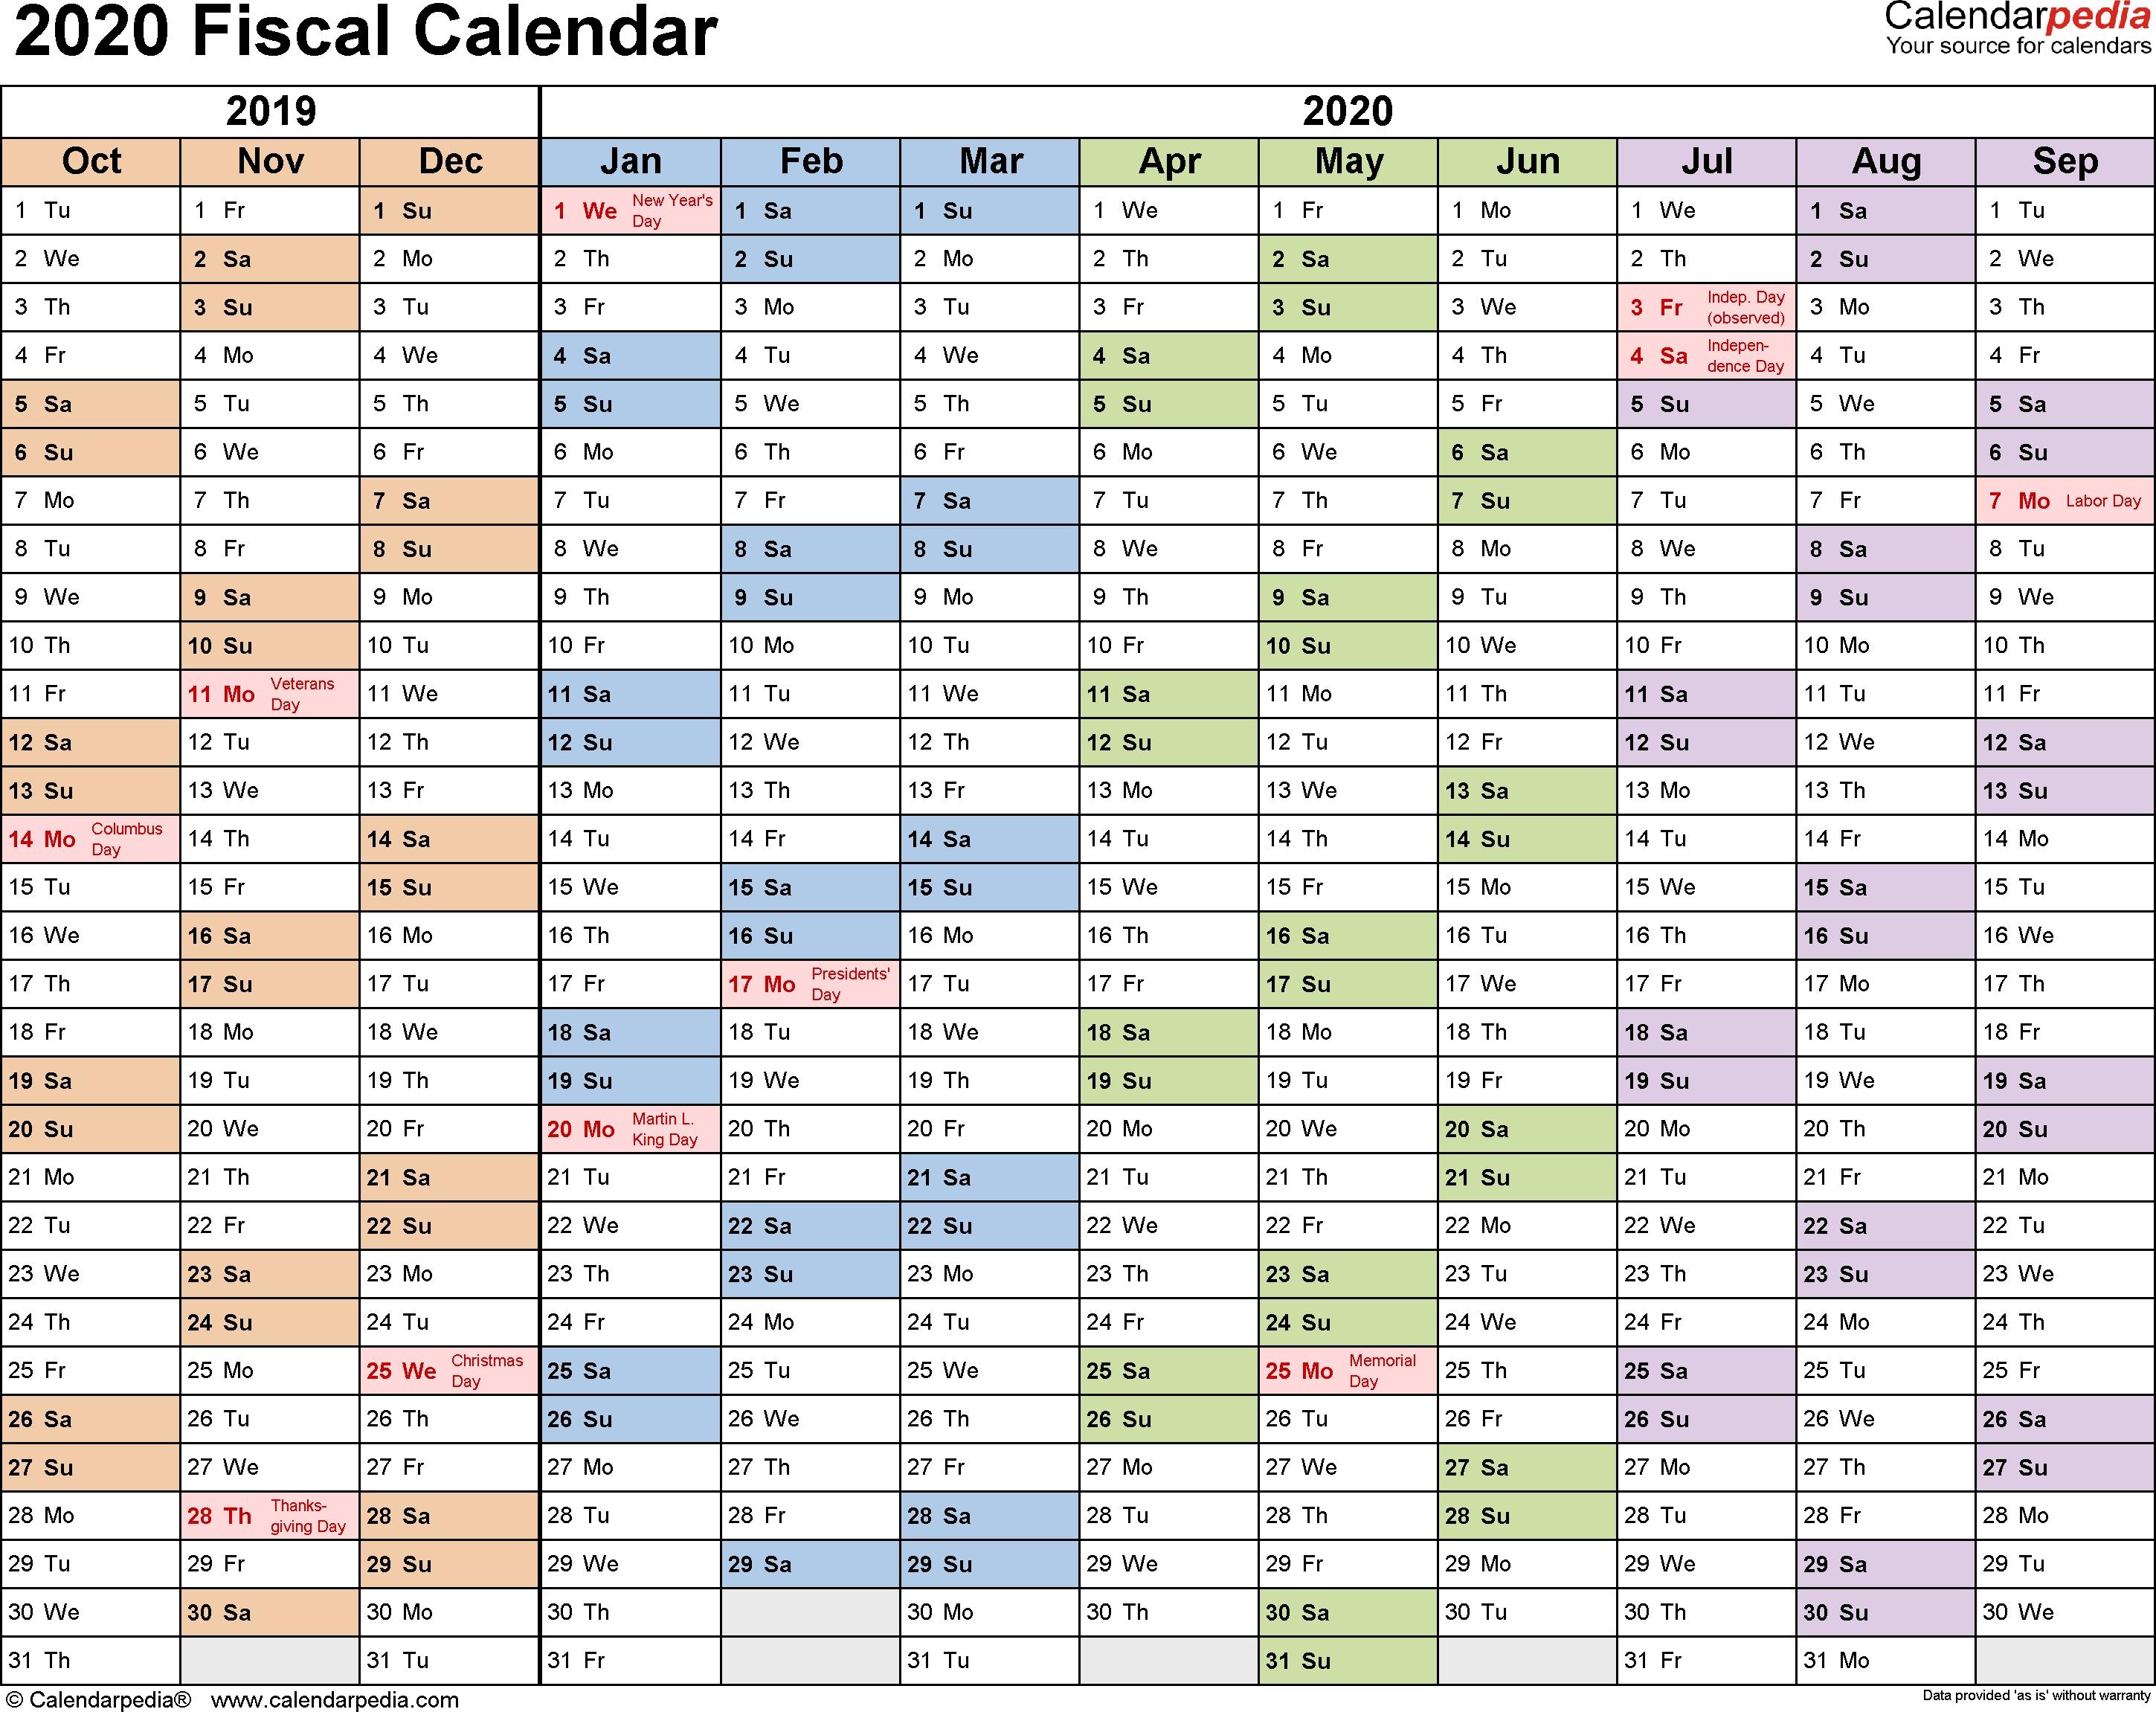 Fiscal Calendars 2020 As Free Printable Pdf Templates  2020 Financial Year Calendar Australia